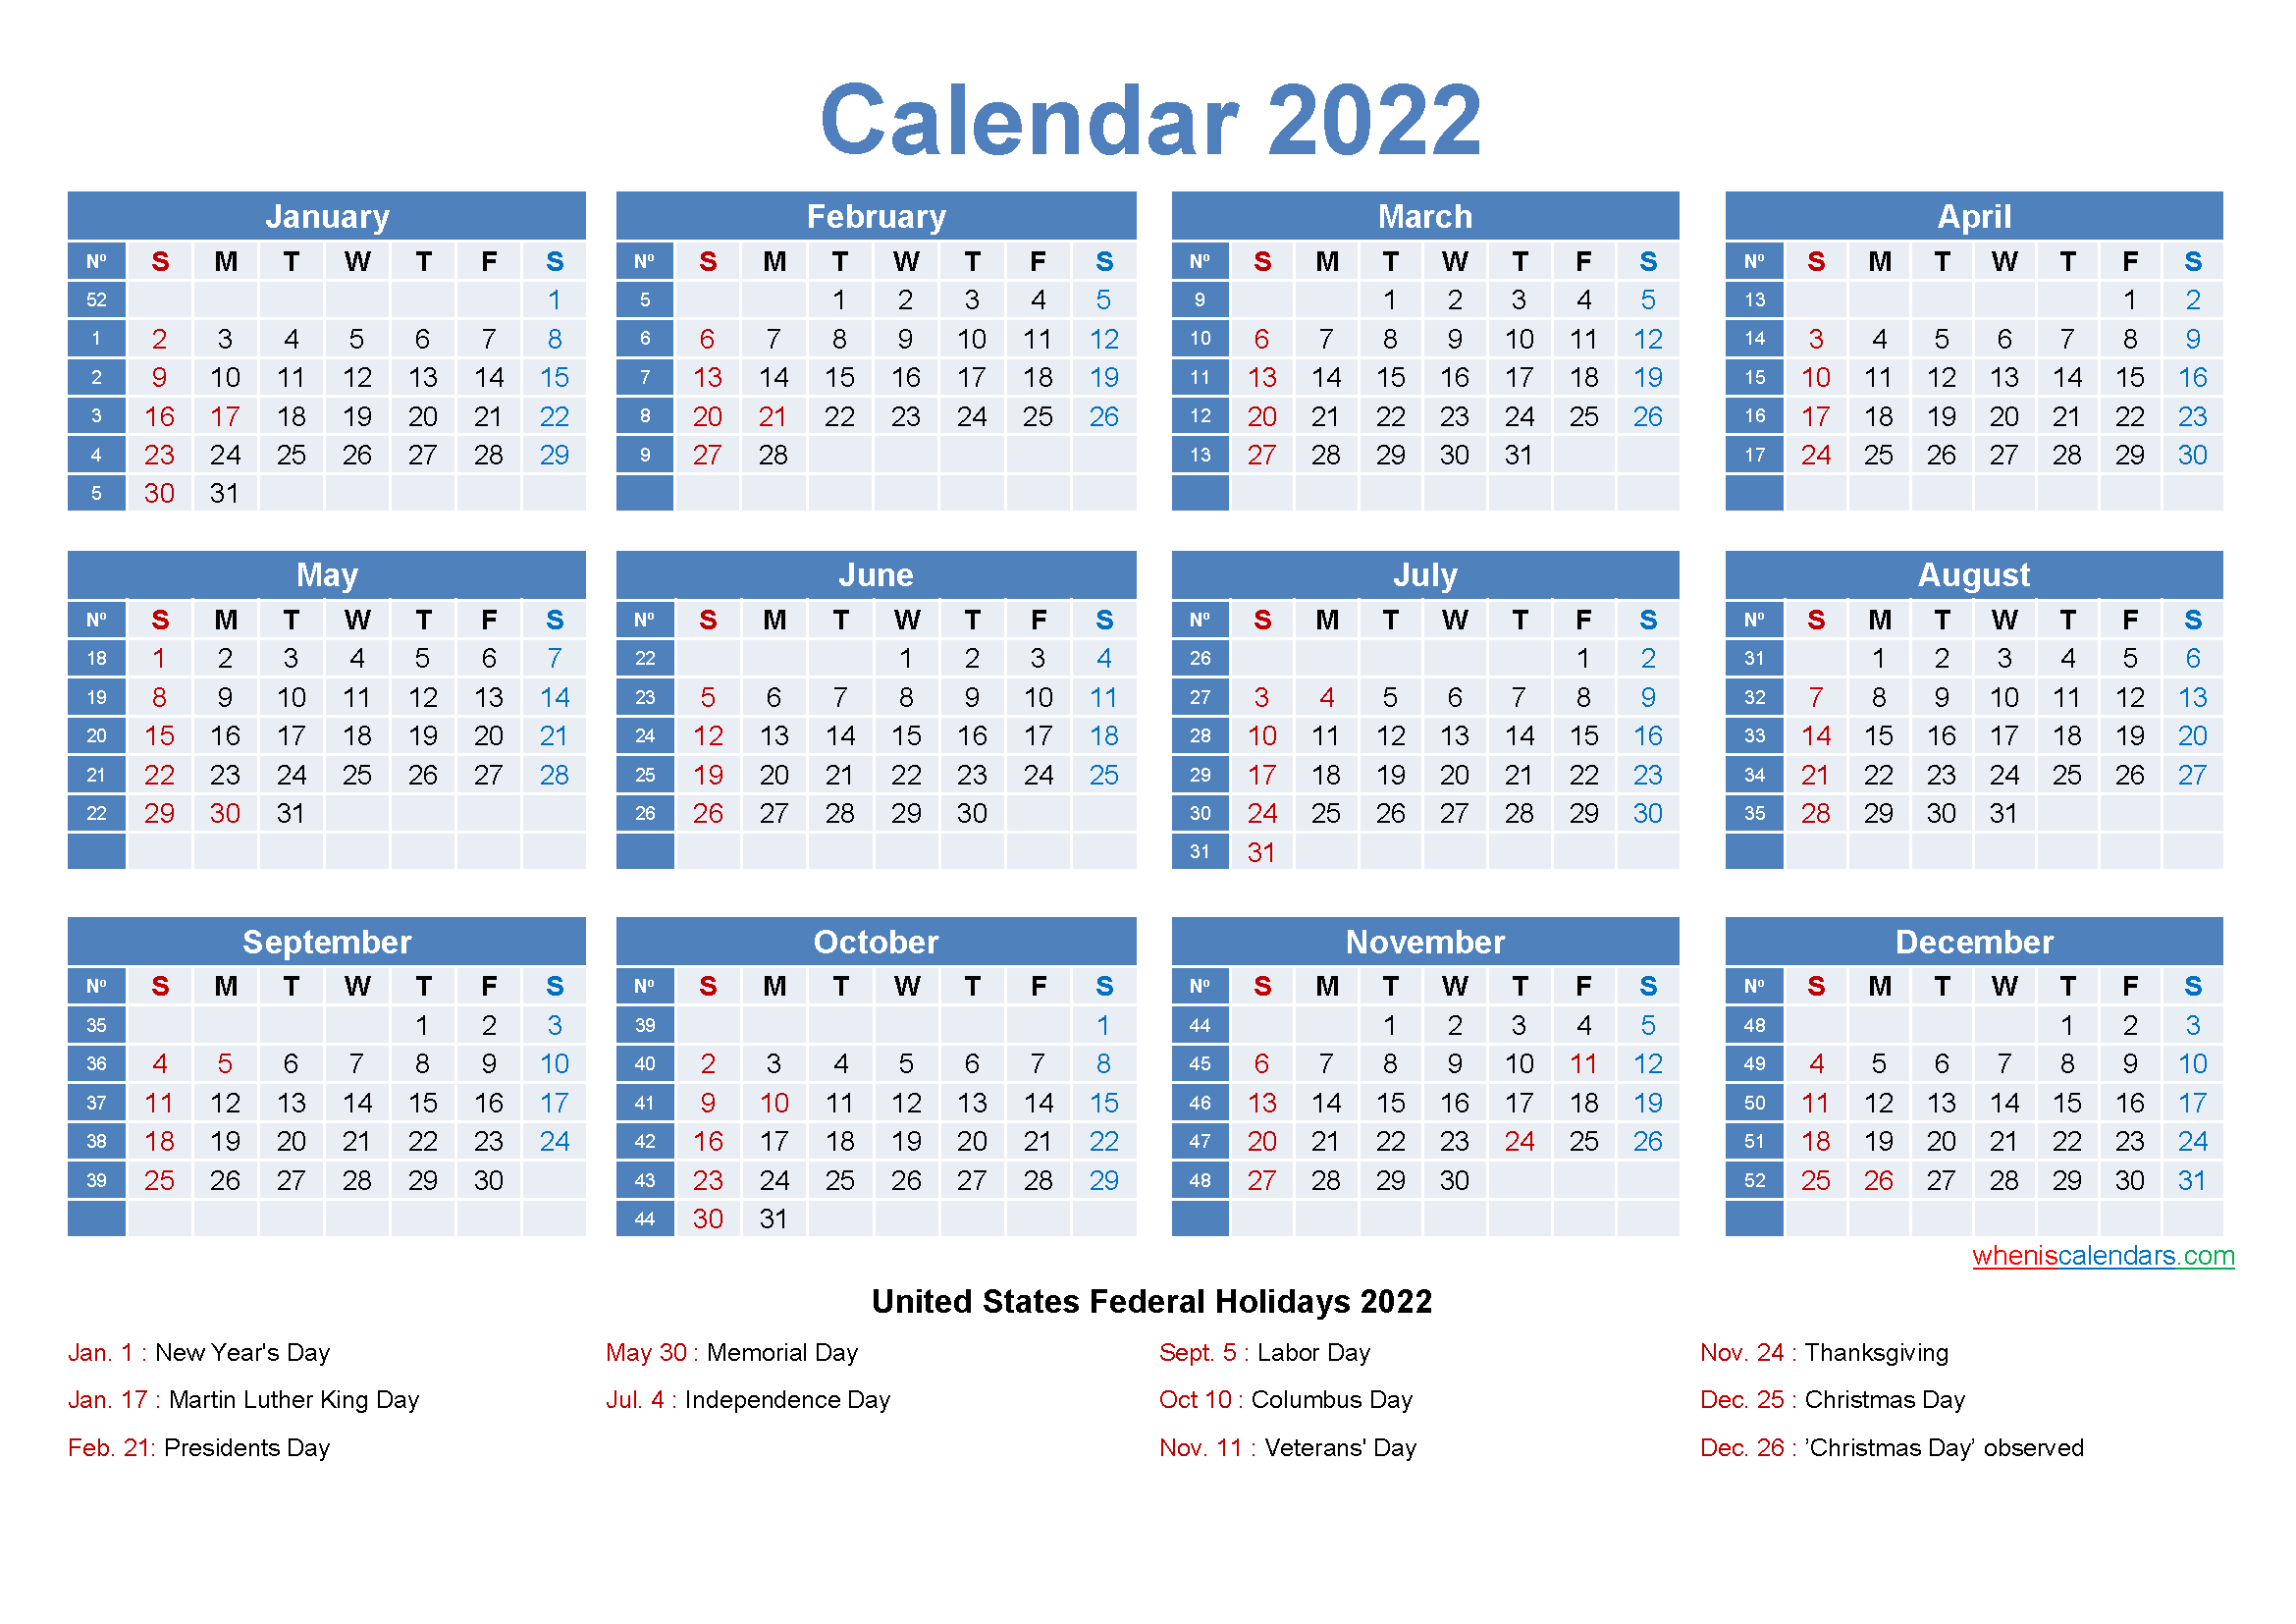 Work Week Calendar 2022.Large Desk Calendar 2022 With Holidays Free Printable 2021 Monthly Calendar With Holidays